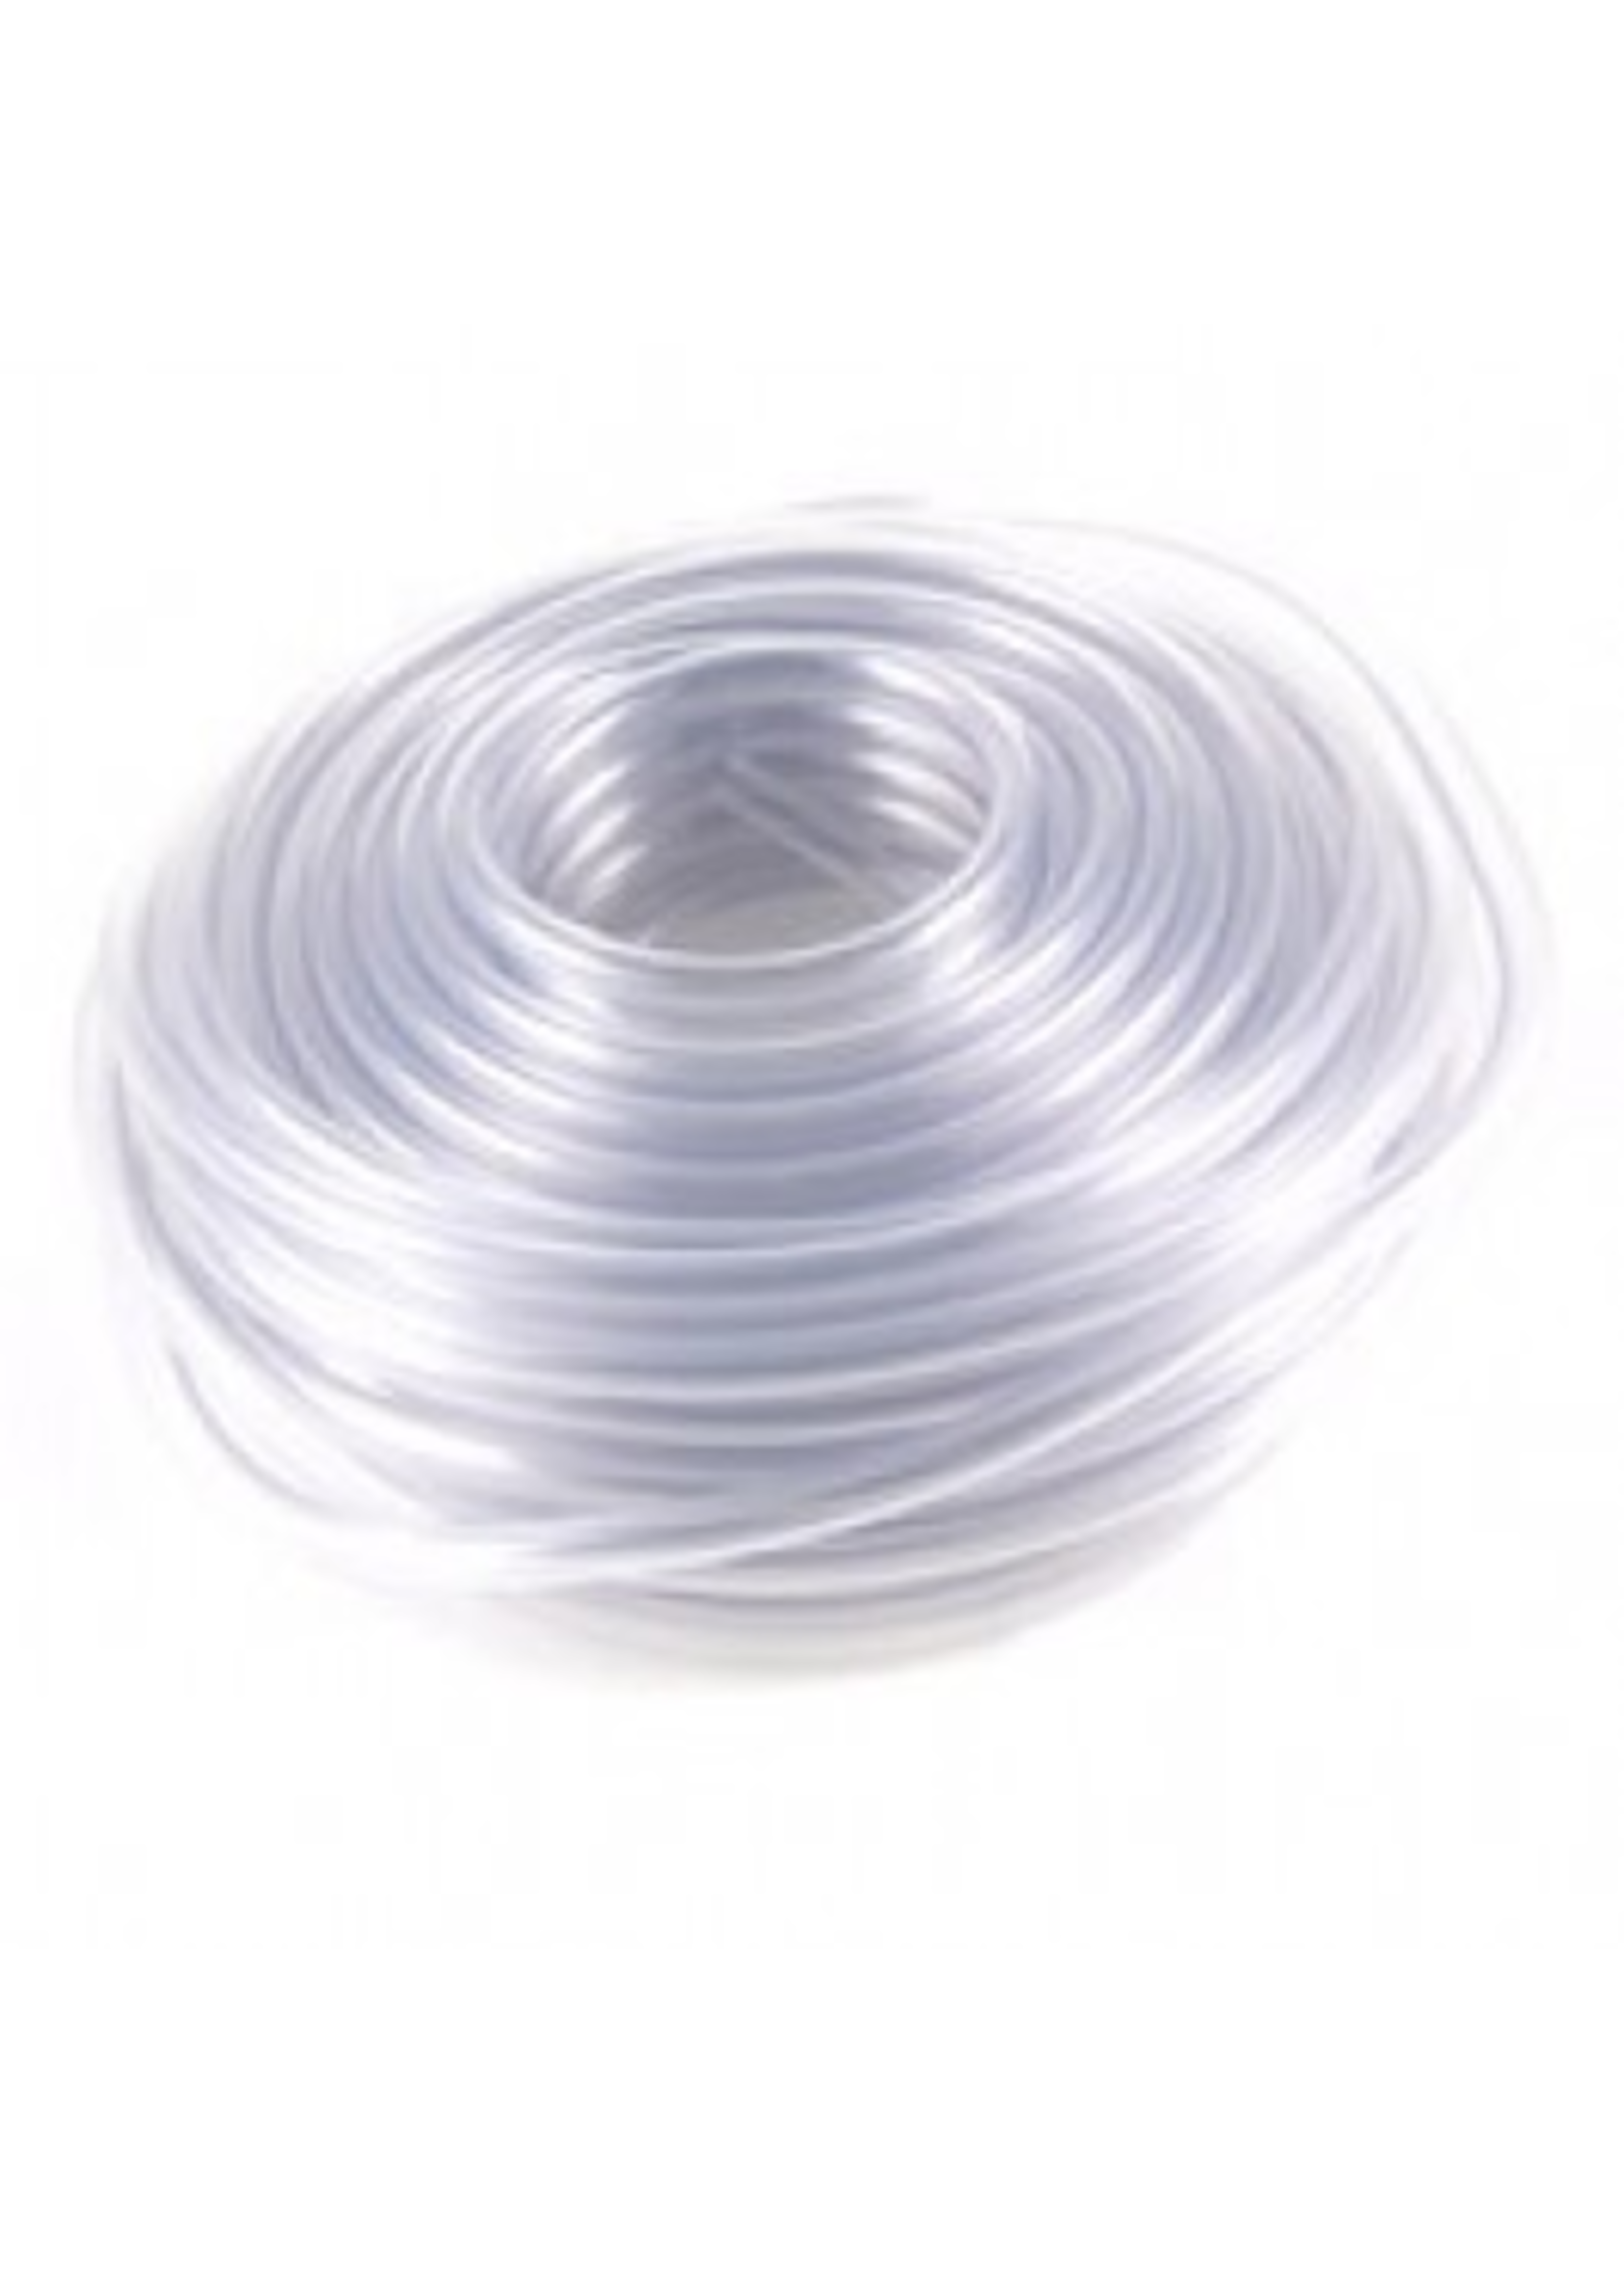 "Tubing Siphon Hose - 7/16"" ID Tubing- 100' length"